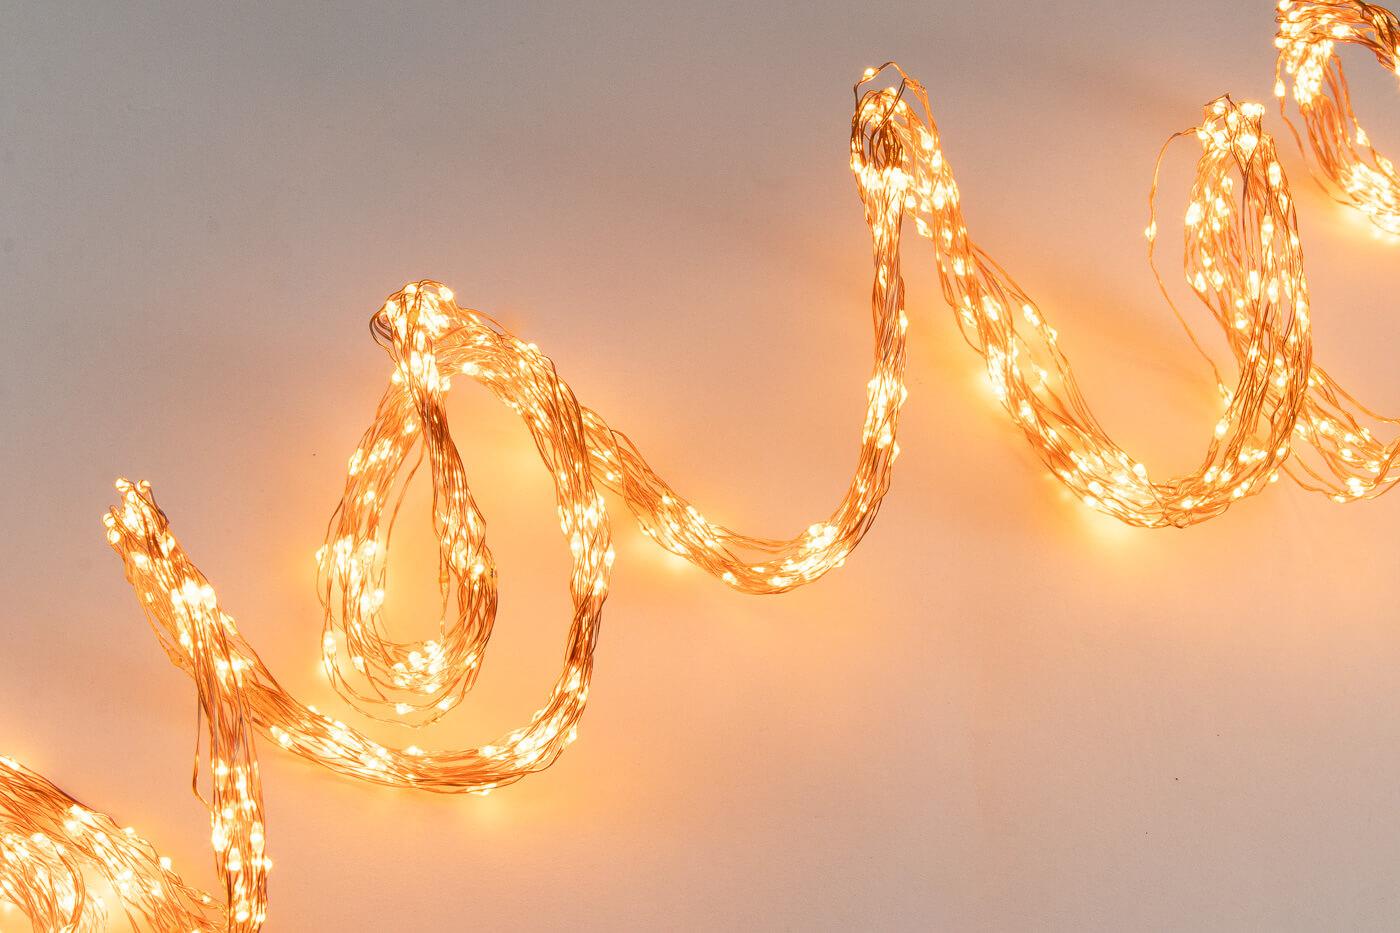 Micro LED-Lichtbündel mit Funkeleffekt 900 flg. bernsteinfarben Lotti 48768